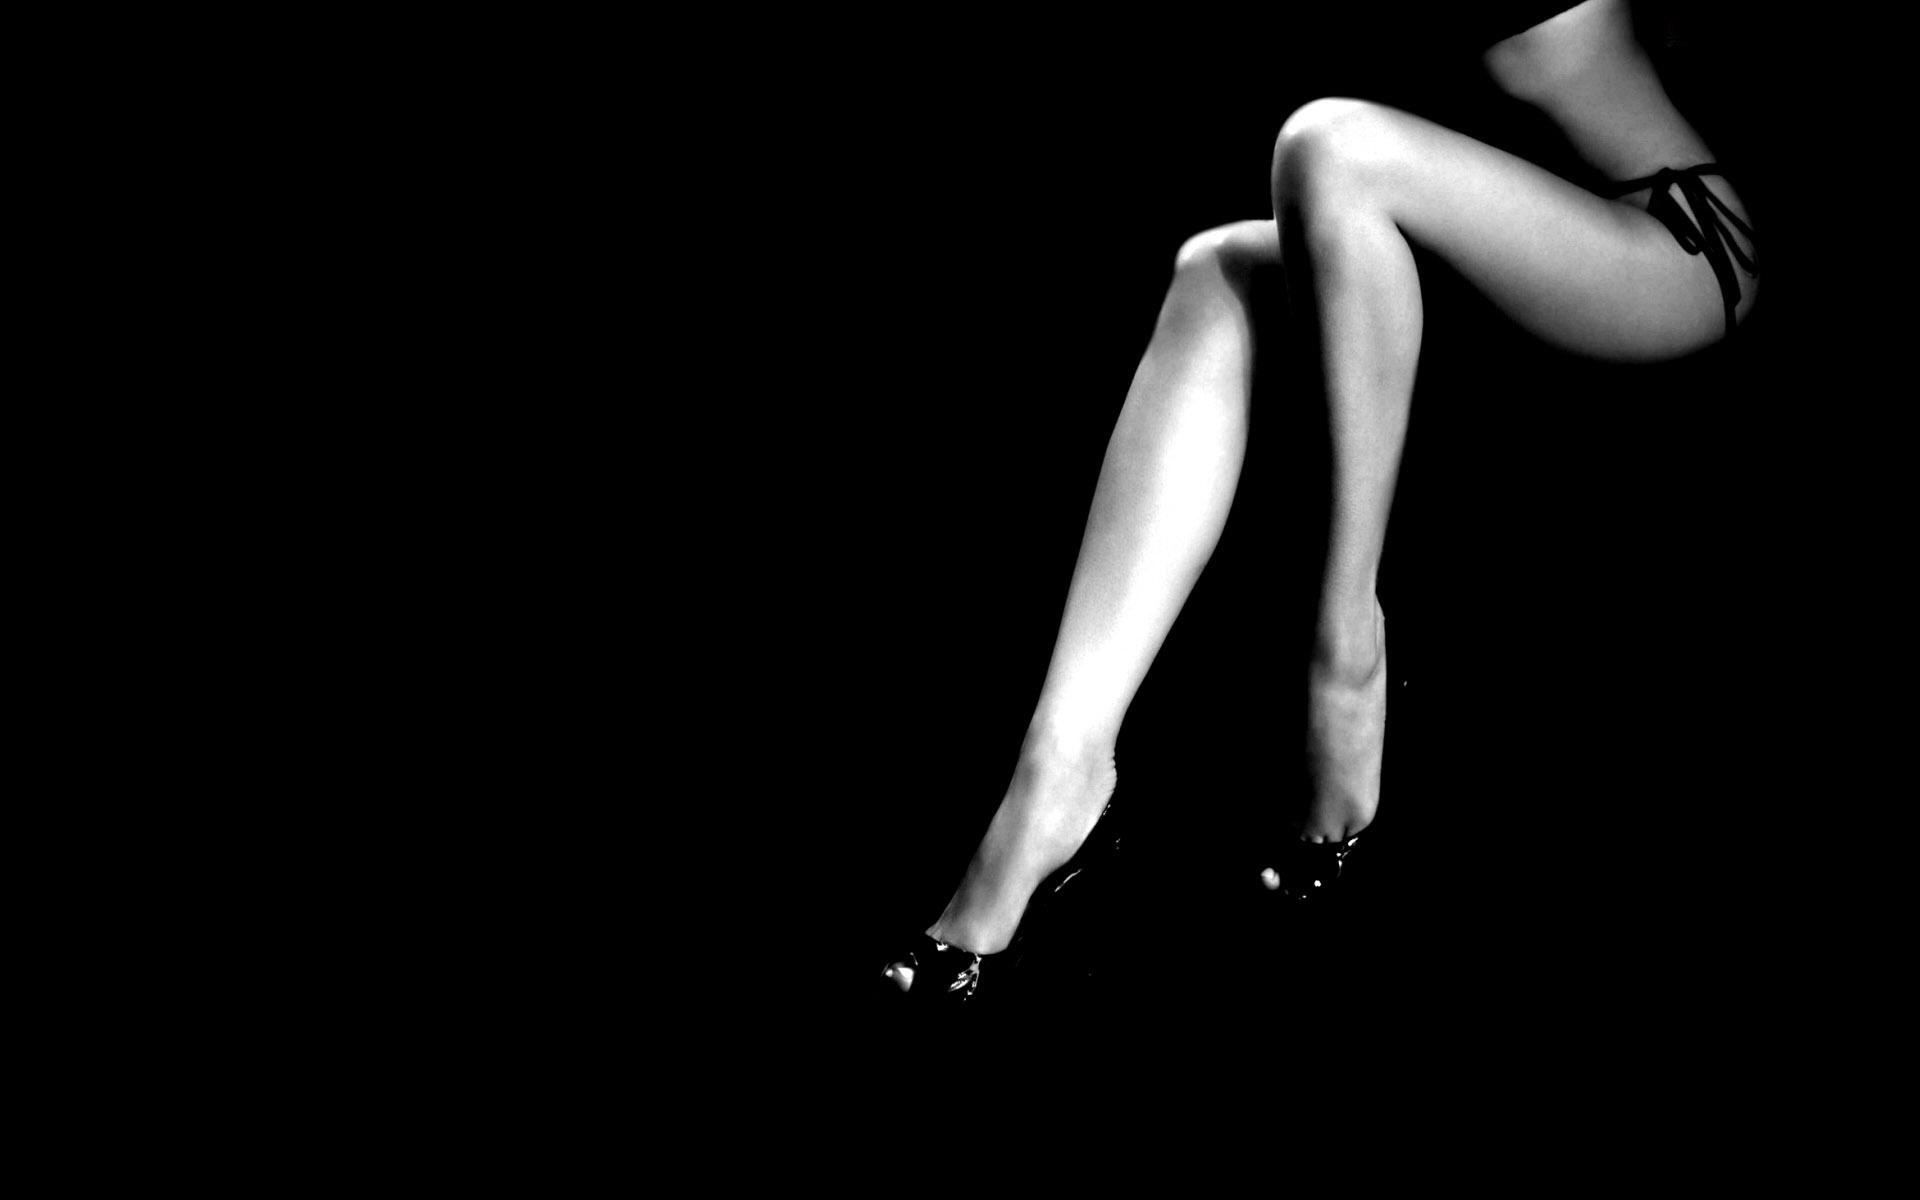 Fotografía - Black & White  Fondo de Pantalla